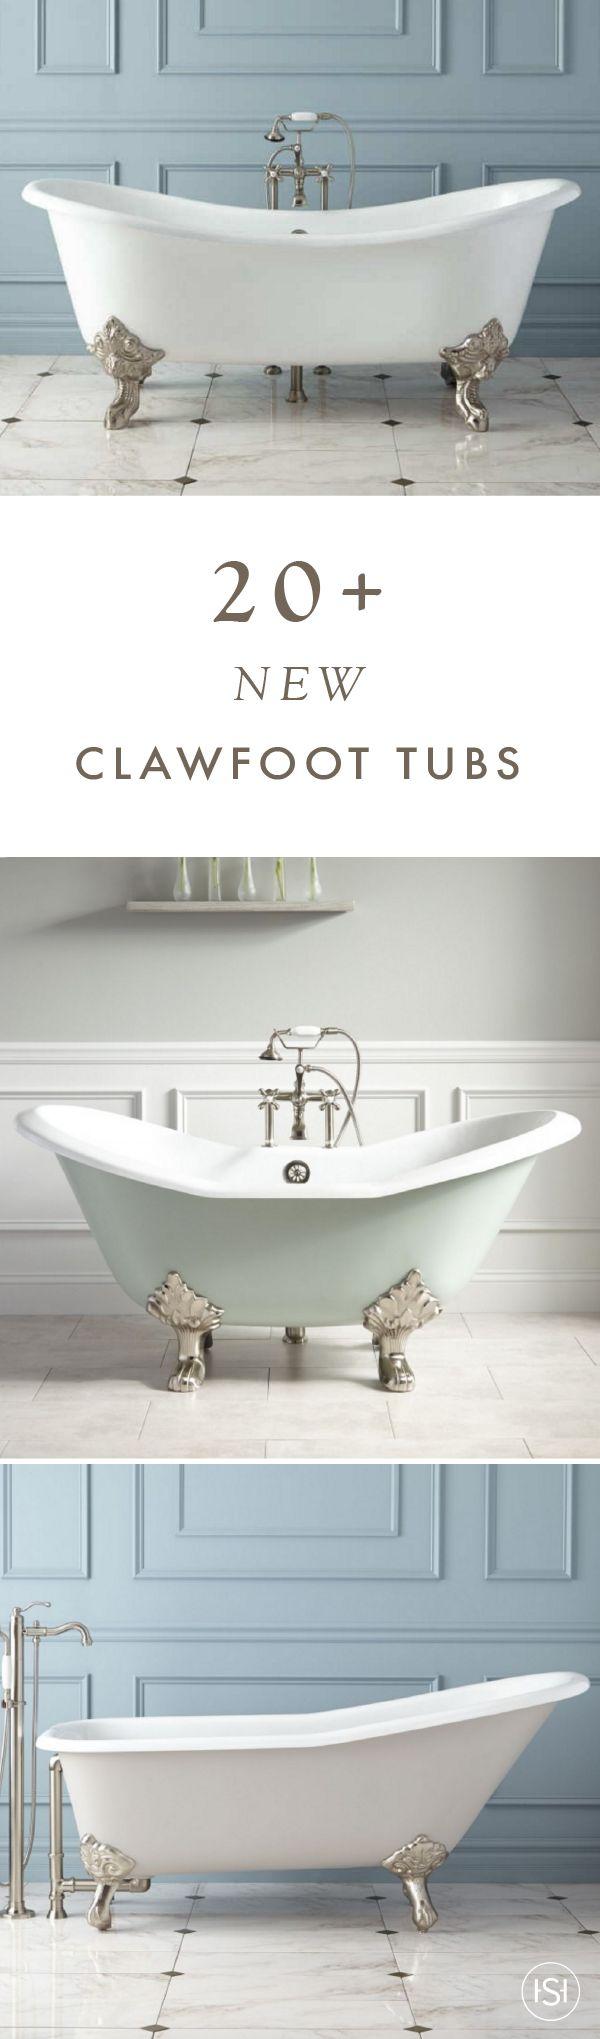 43 Most fabulous mood-setting romantic bathrooms ever | Tubs, Bath ...